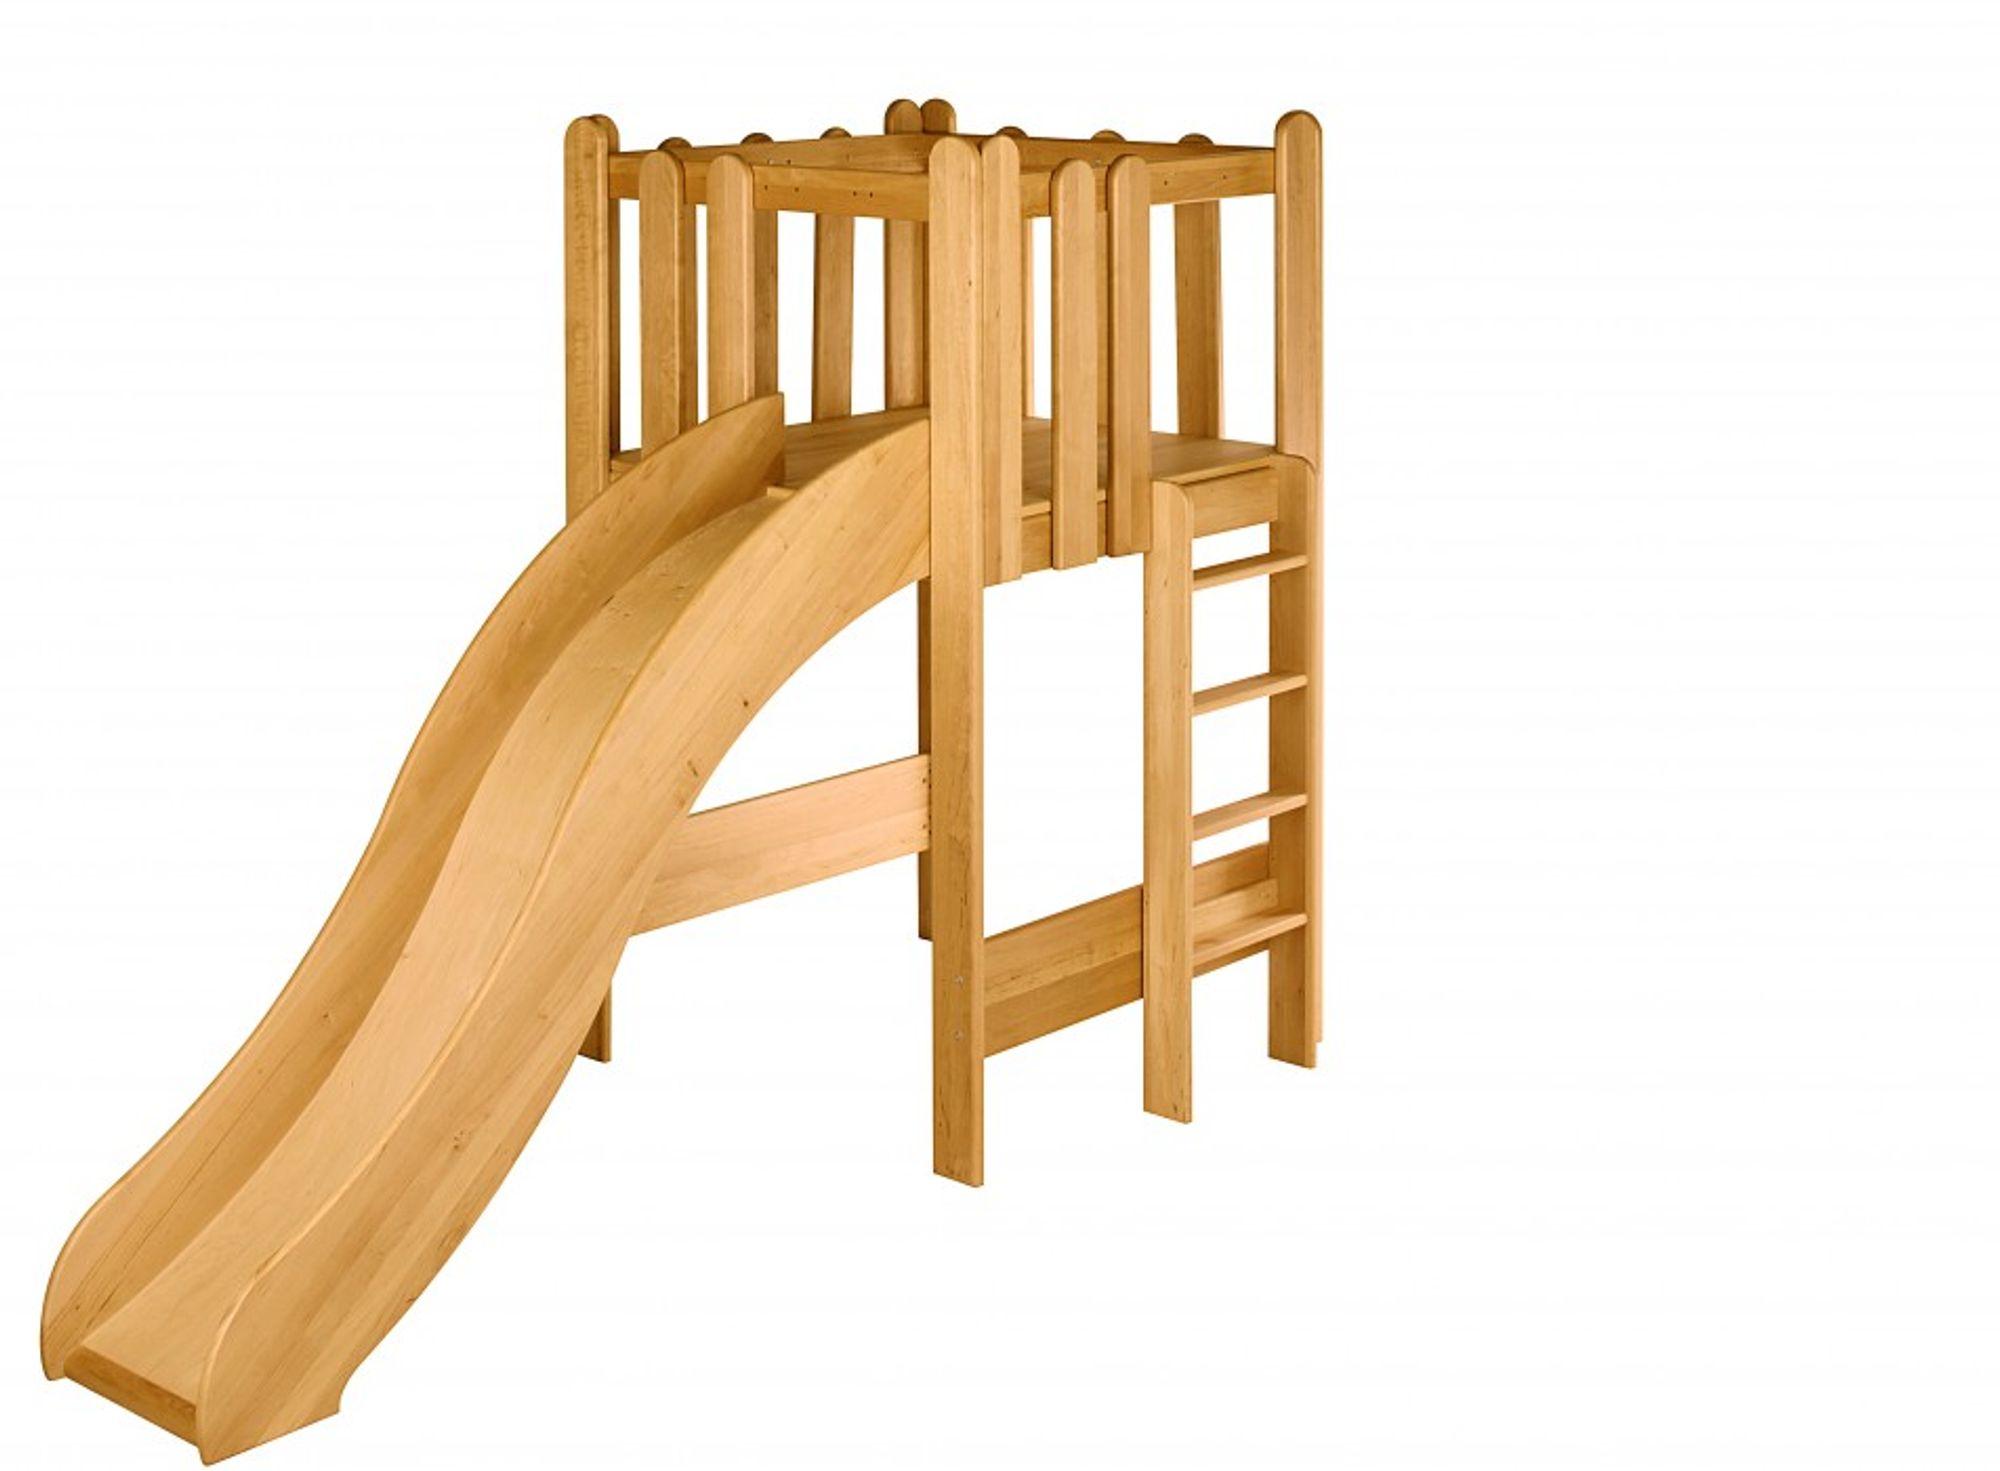 Rutsche Kinderzimmer.Noah Rutsche Zum Spielturm Erle